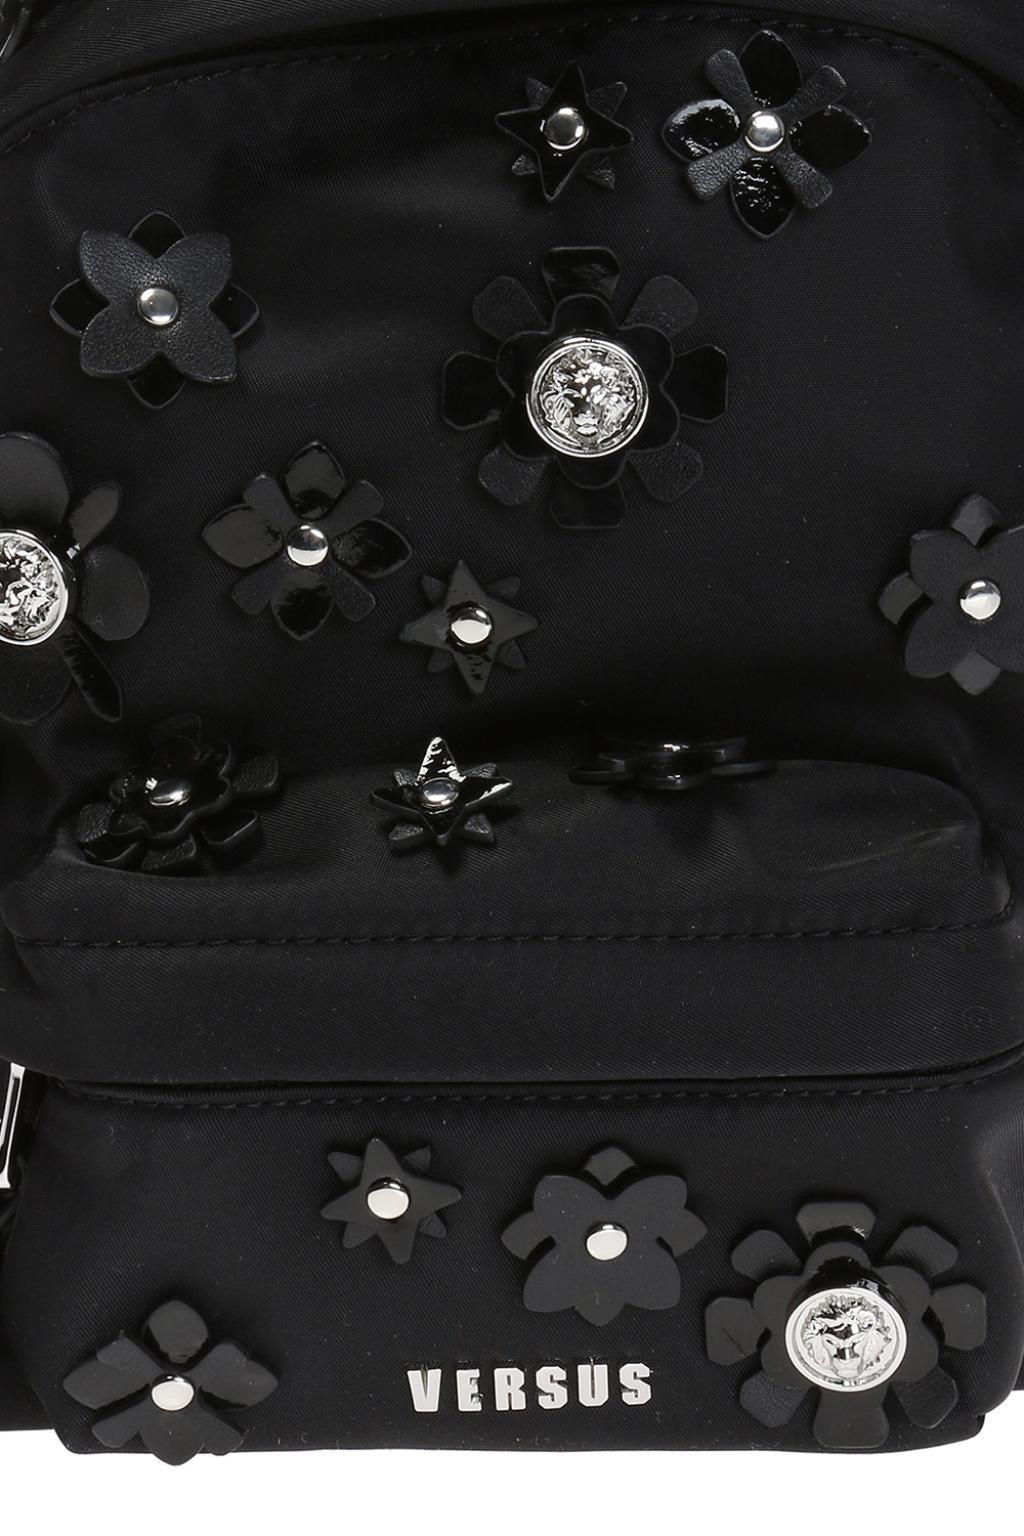 Versus Leather Appliqued Backpack in Black